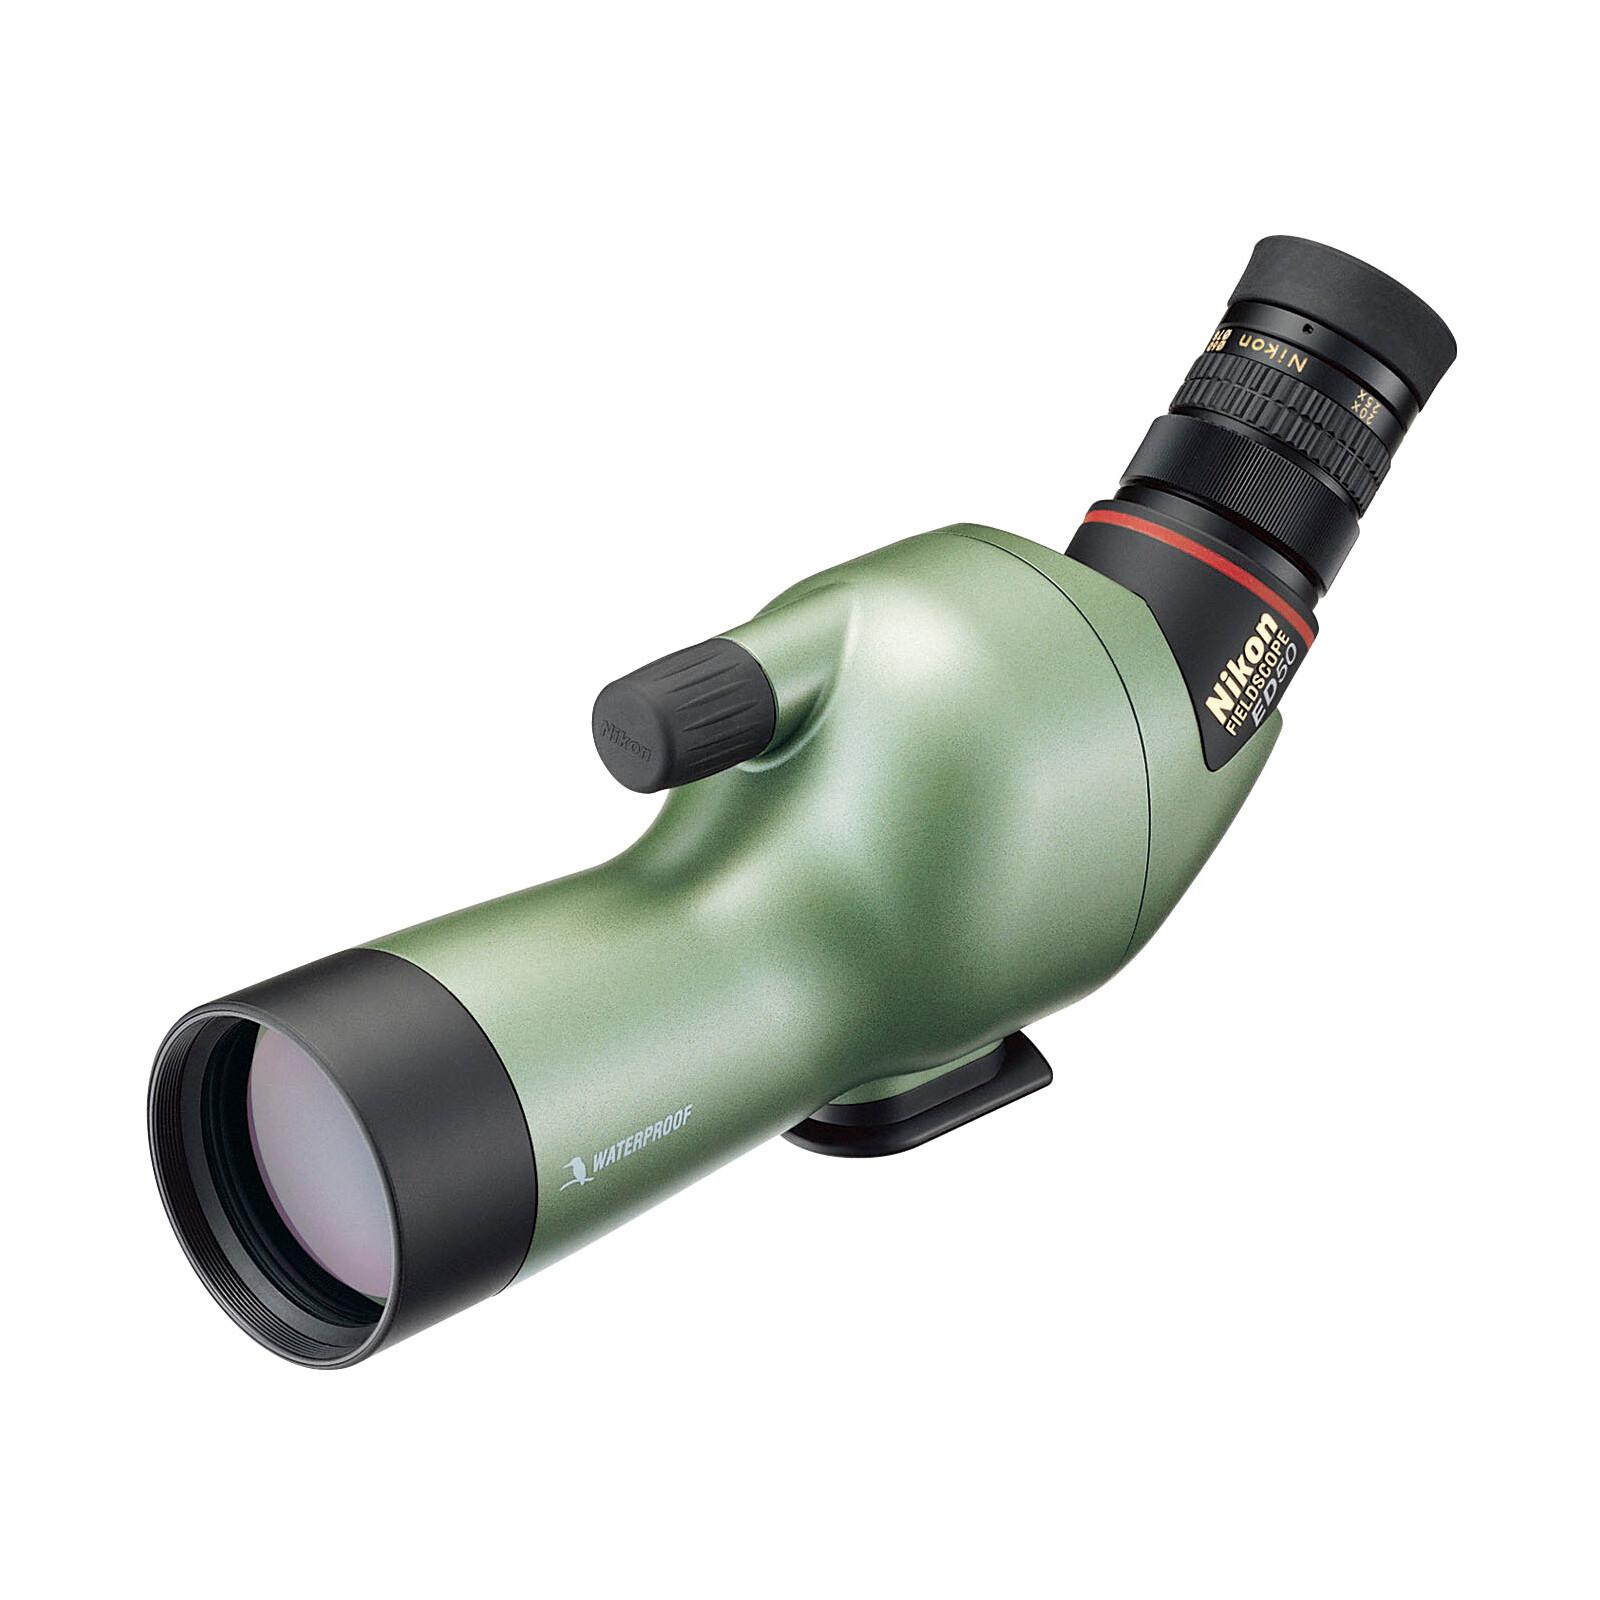 Nikon ED50 Beobachtungsfernrohr Angled Grün Perlglanz